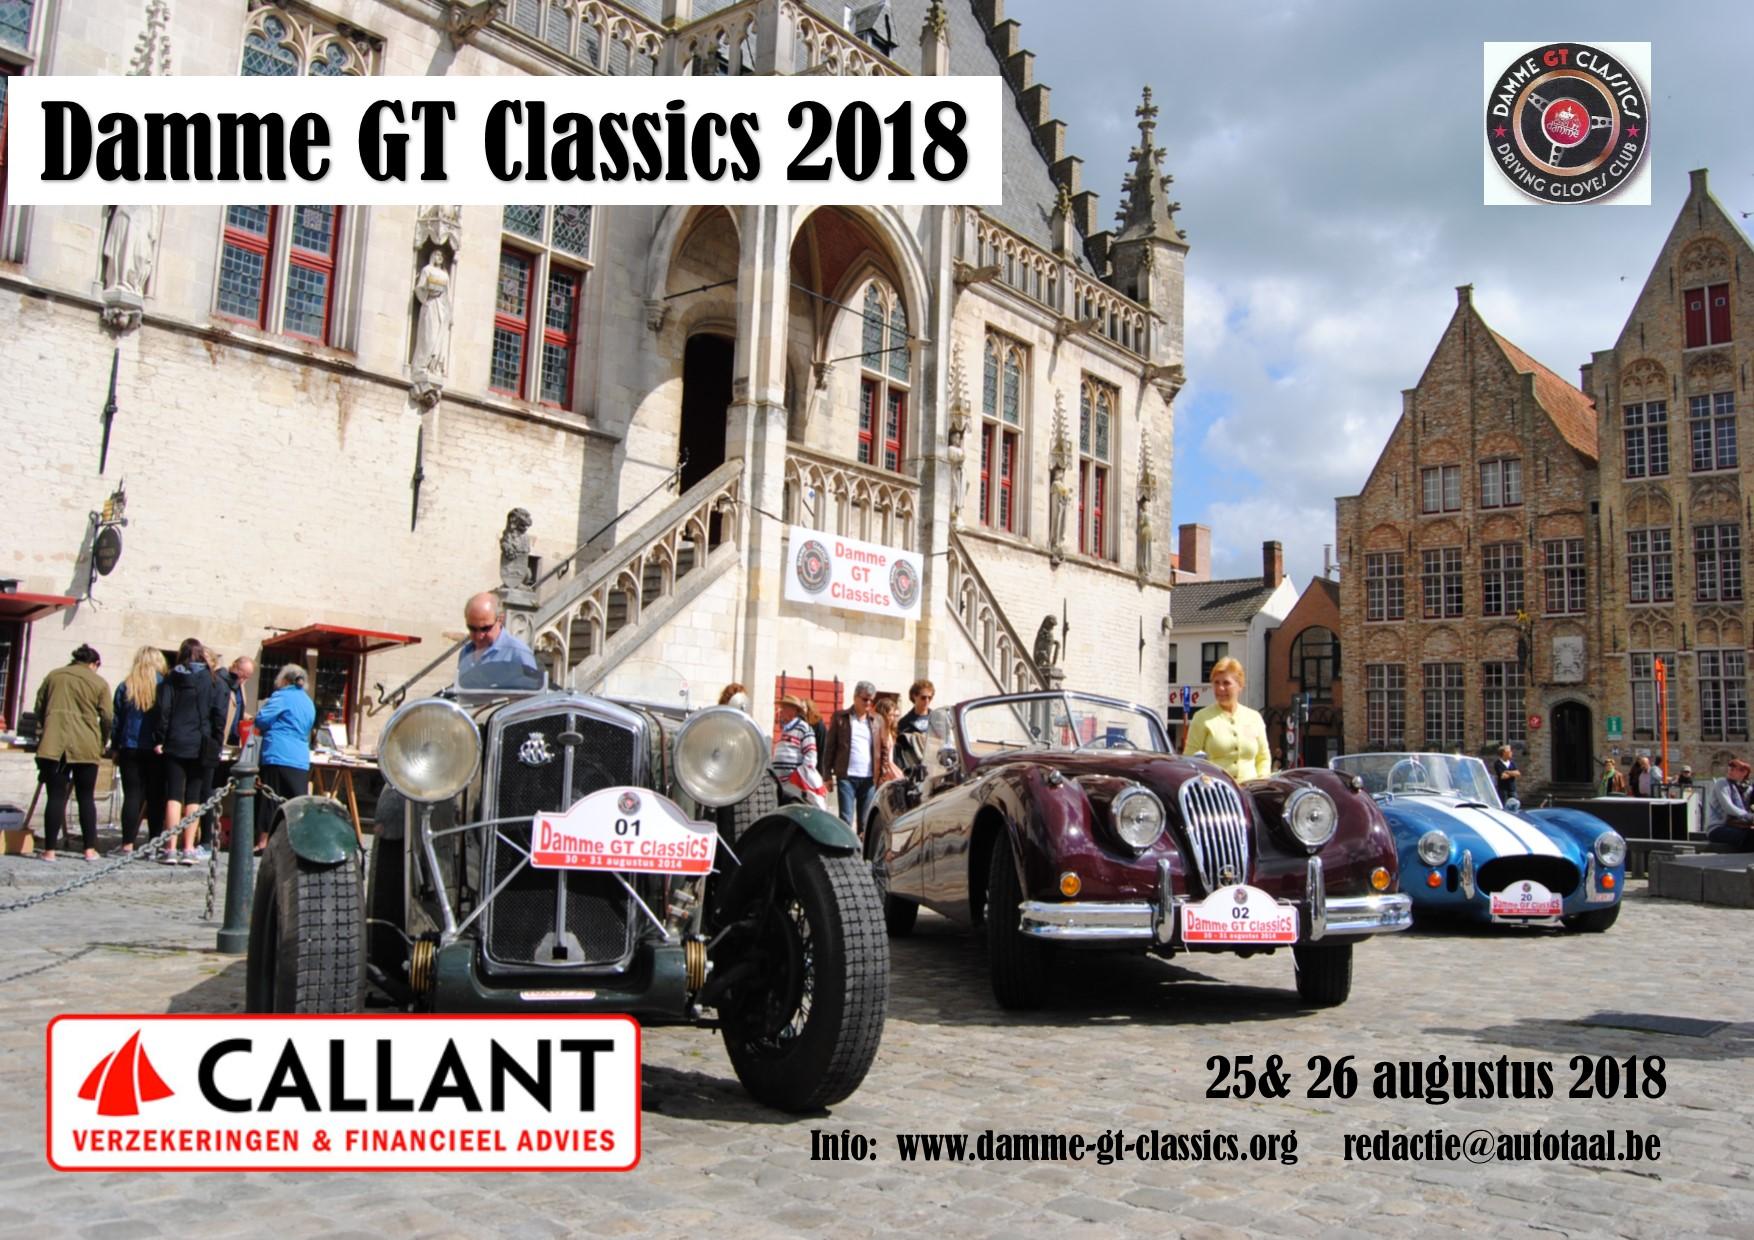 Damme GT Classics 2018.  Vincent Arpons.